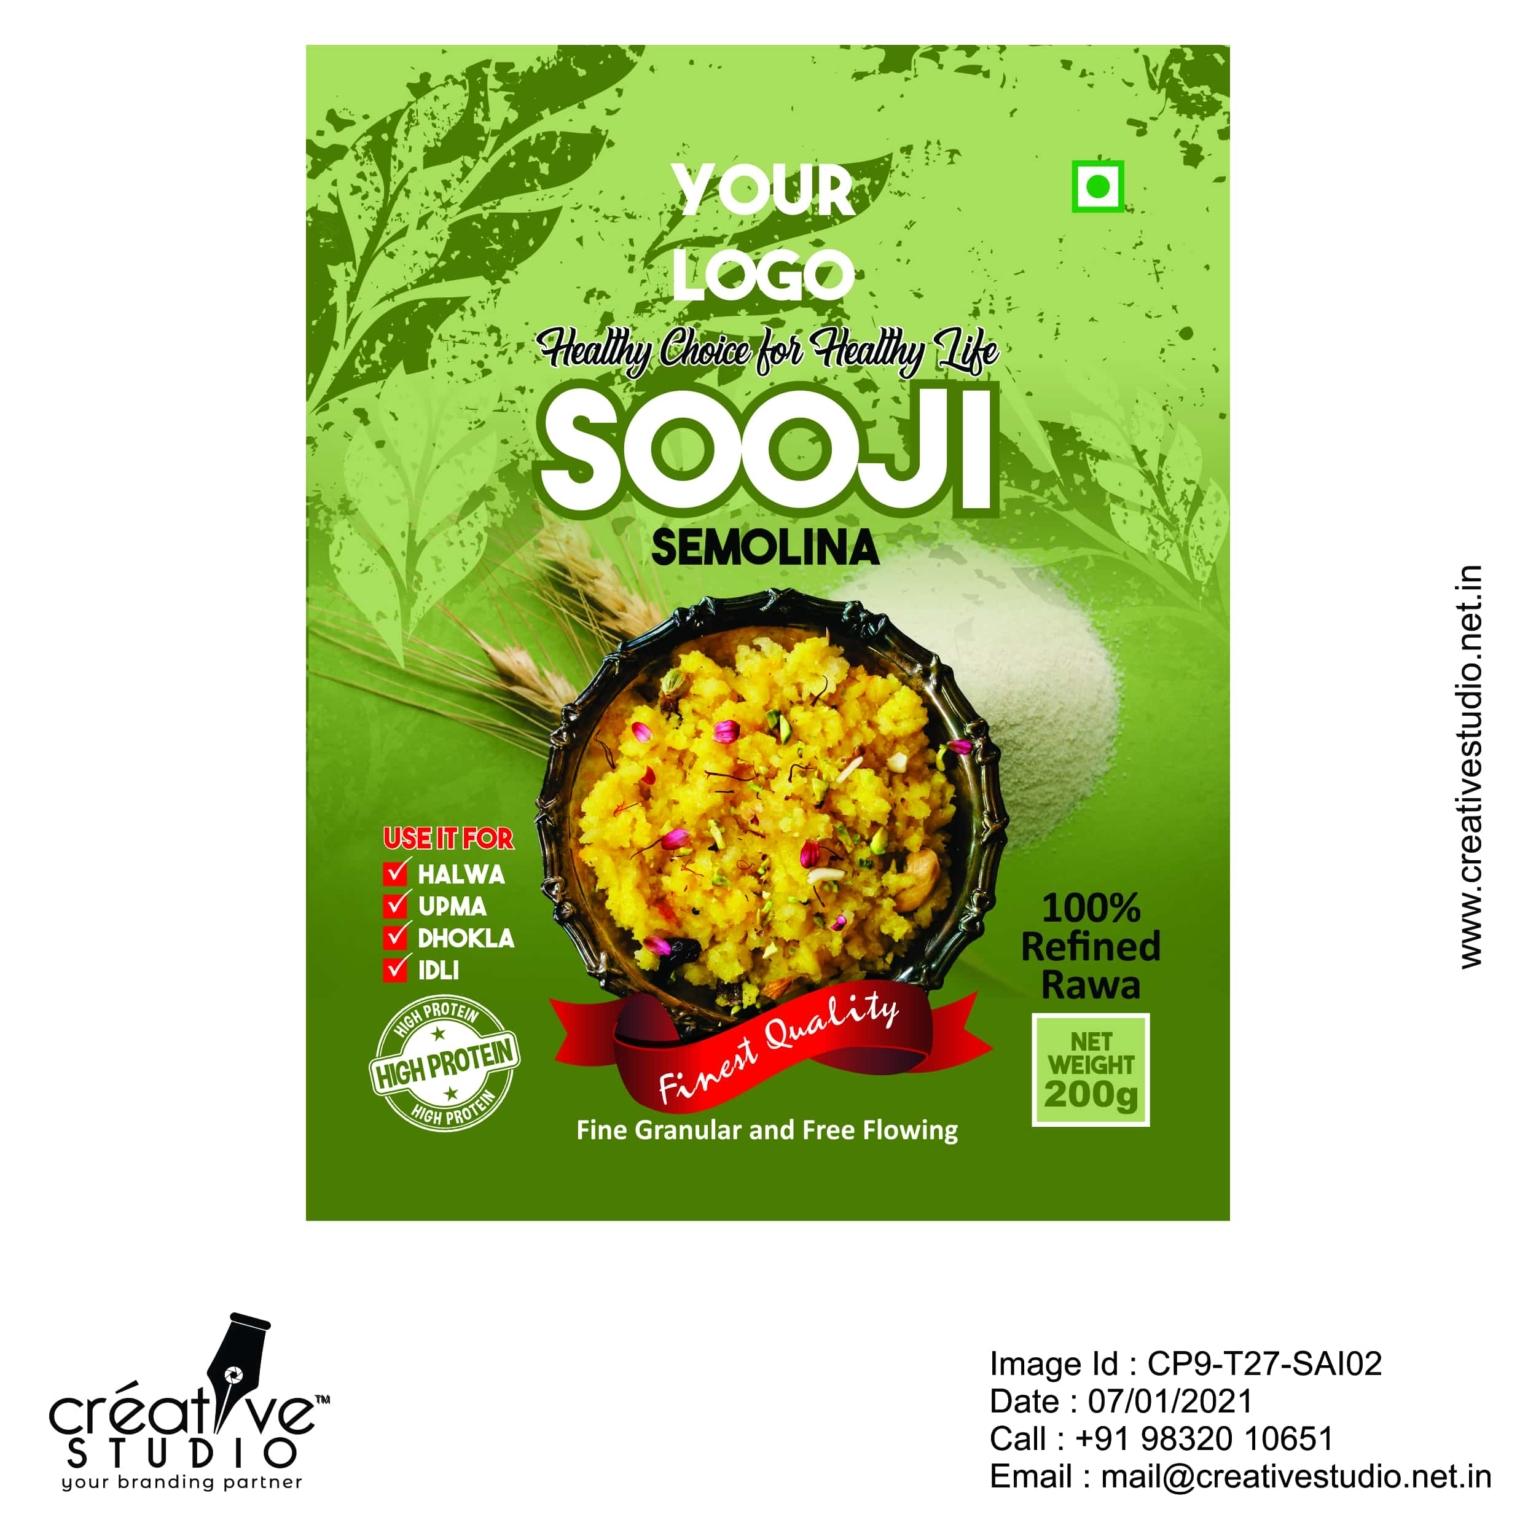 SOOJI - Other Design